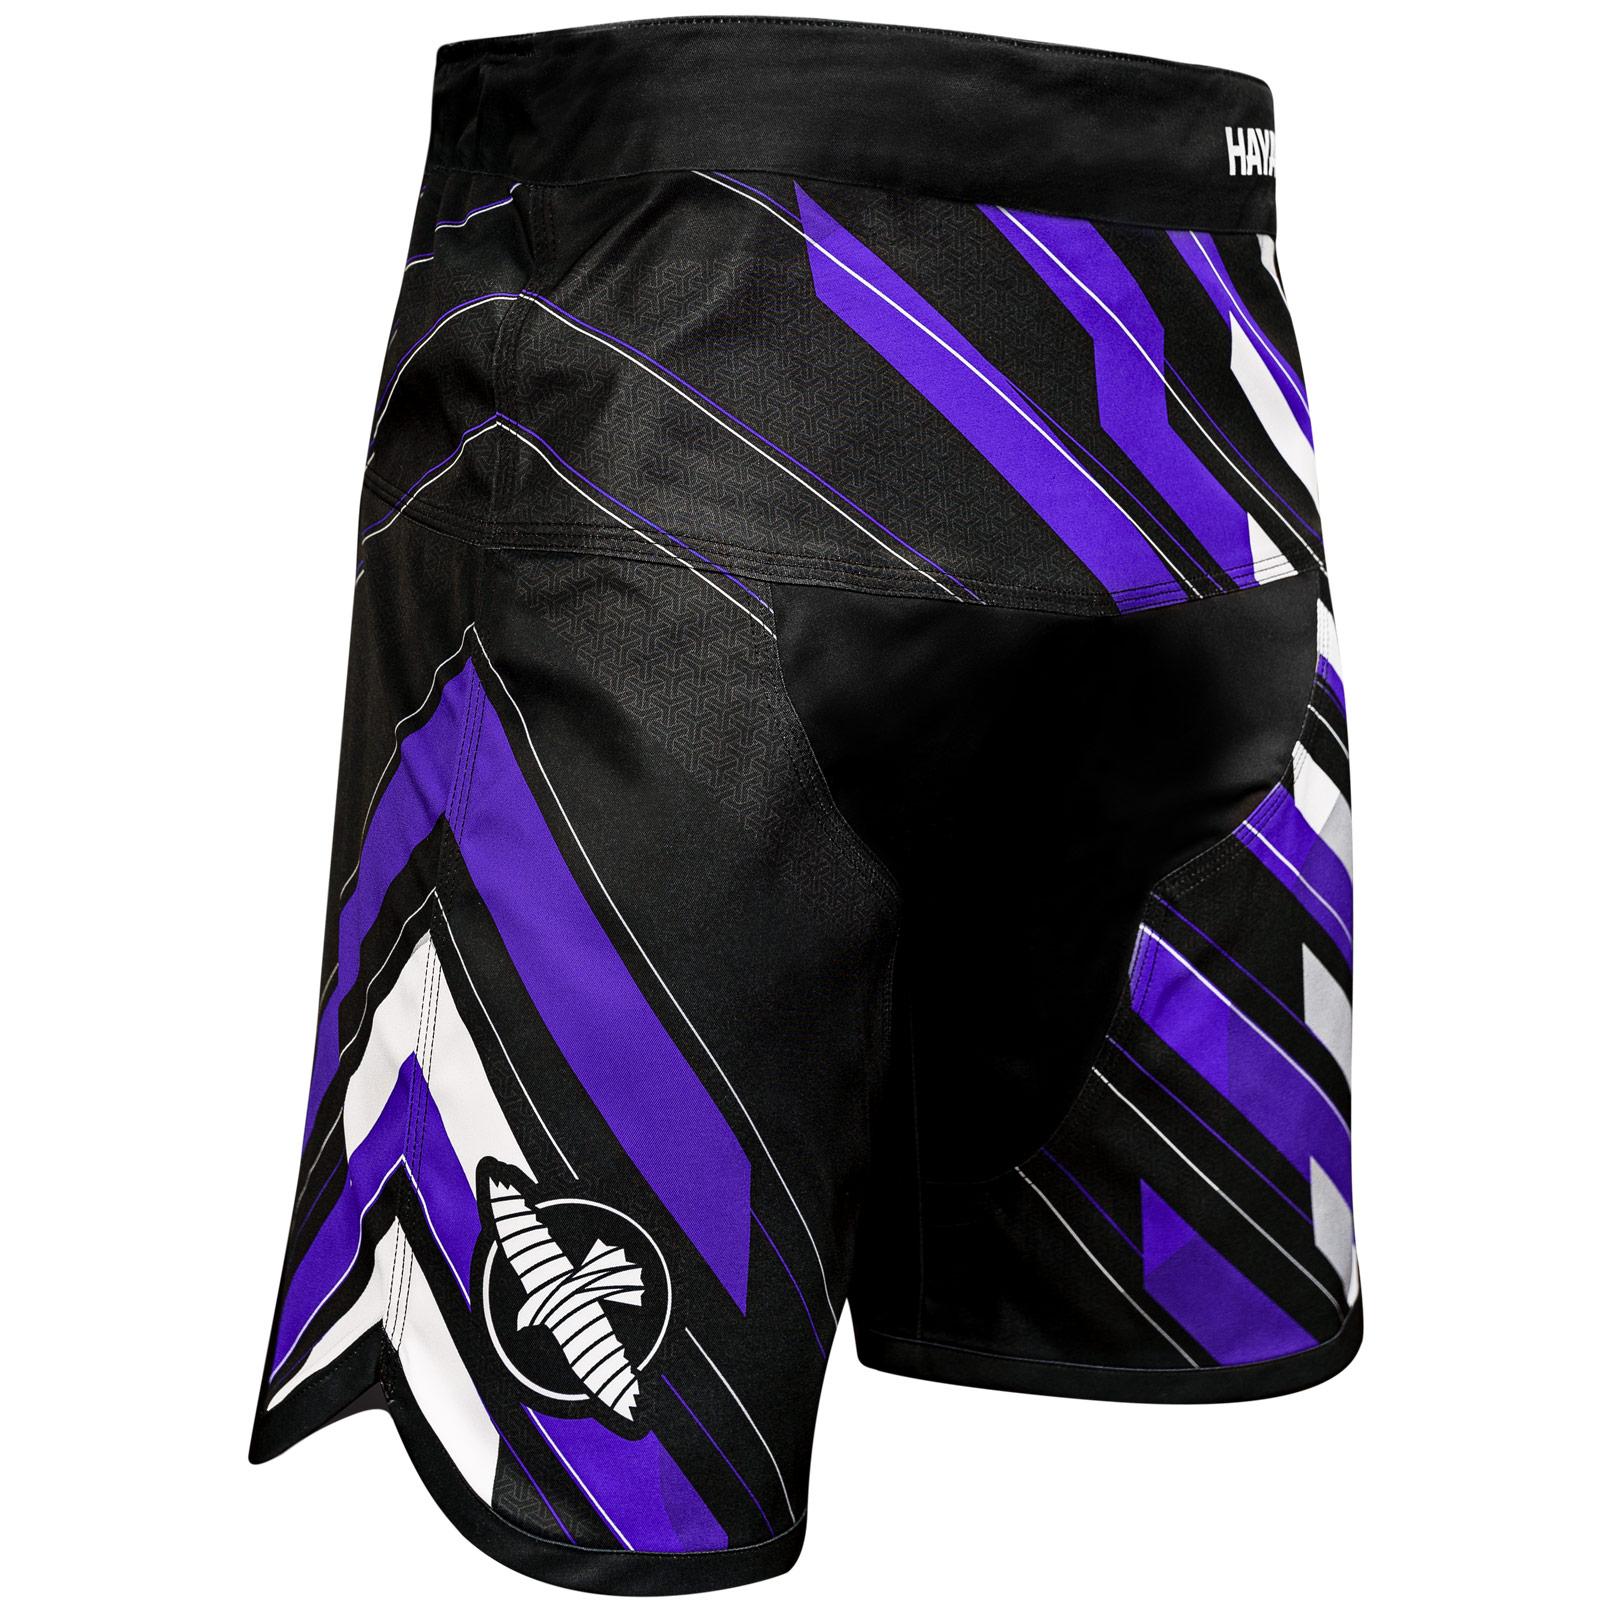 Metaru Charged - Jiu Jitsu Shorts - Purple